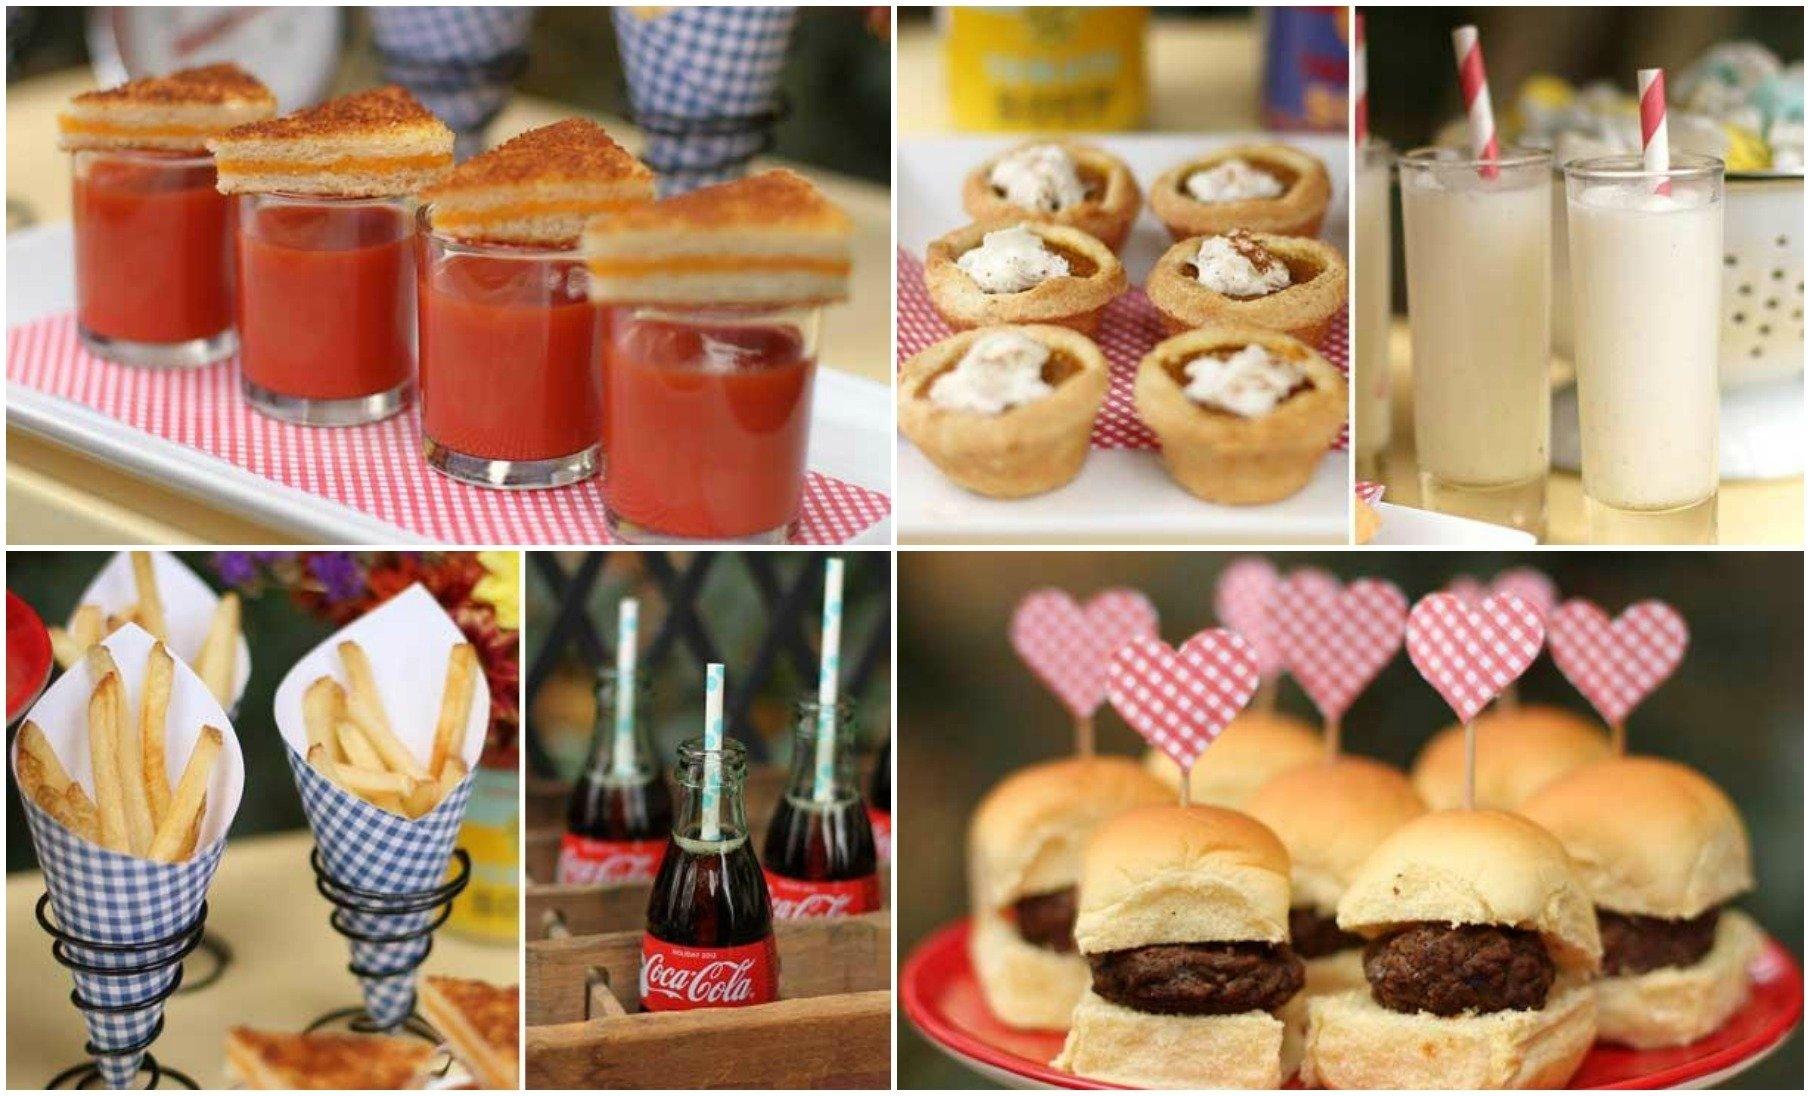 10 Cute Creative Bridal Shower Food Ideas lunch ideas for bridal showers best of bridal shower ideas recipe 3 2020